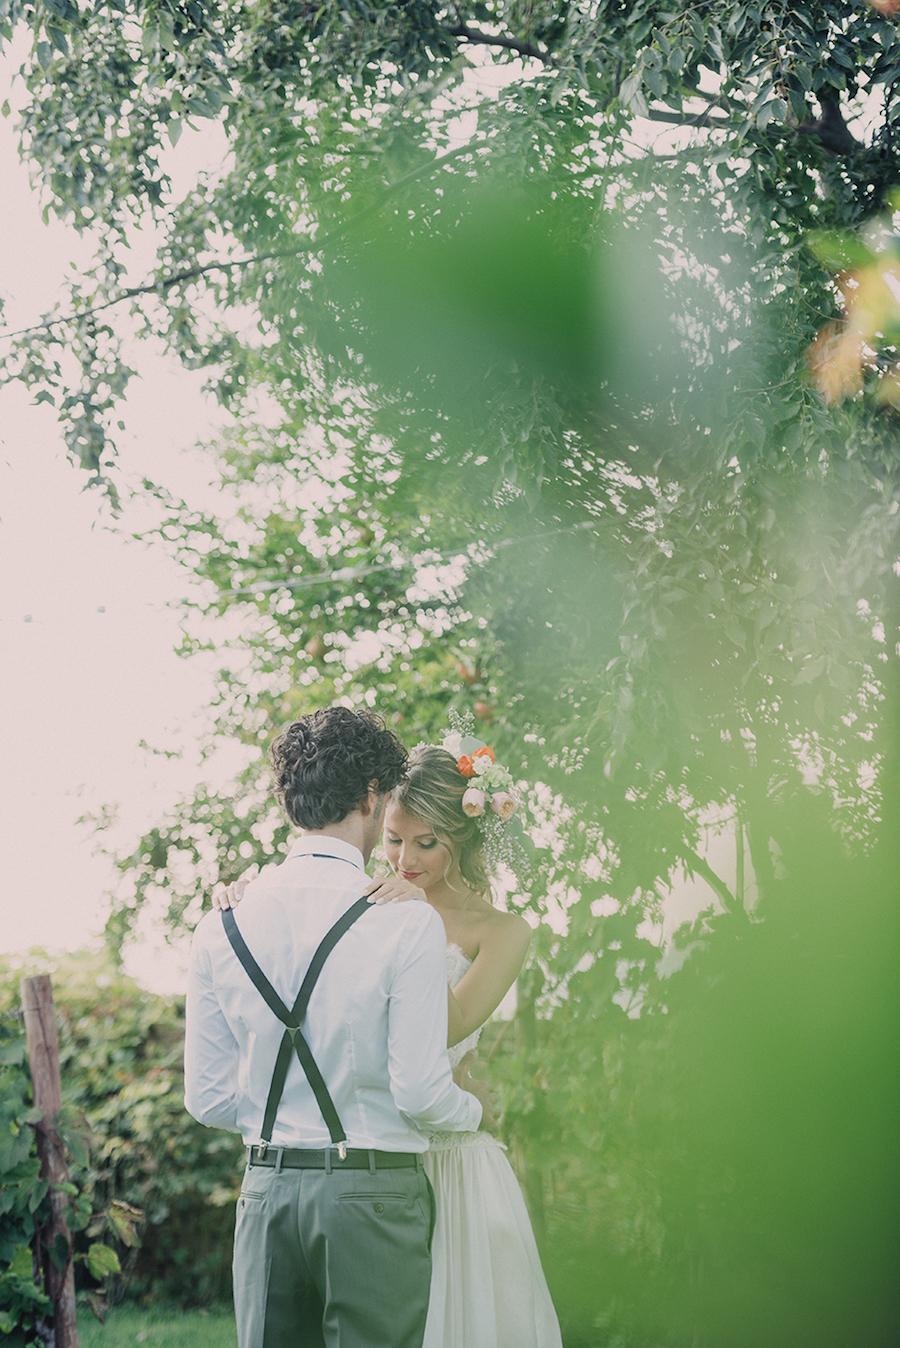 matrimonio-bucolico-boho-chic-gradisca-portento-wedding-wonderland-13